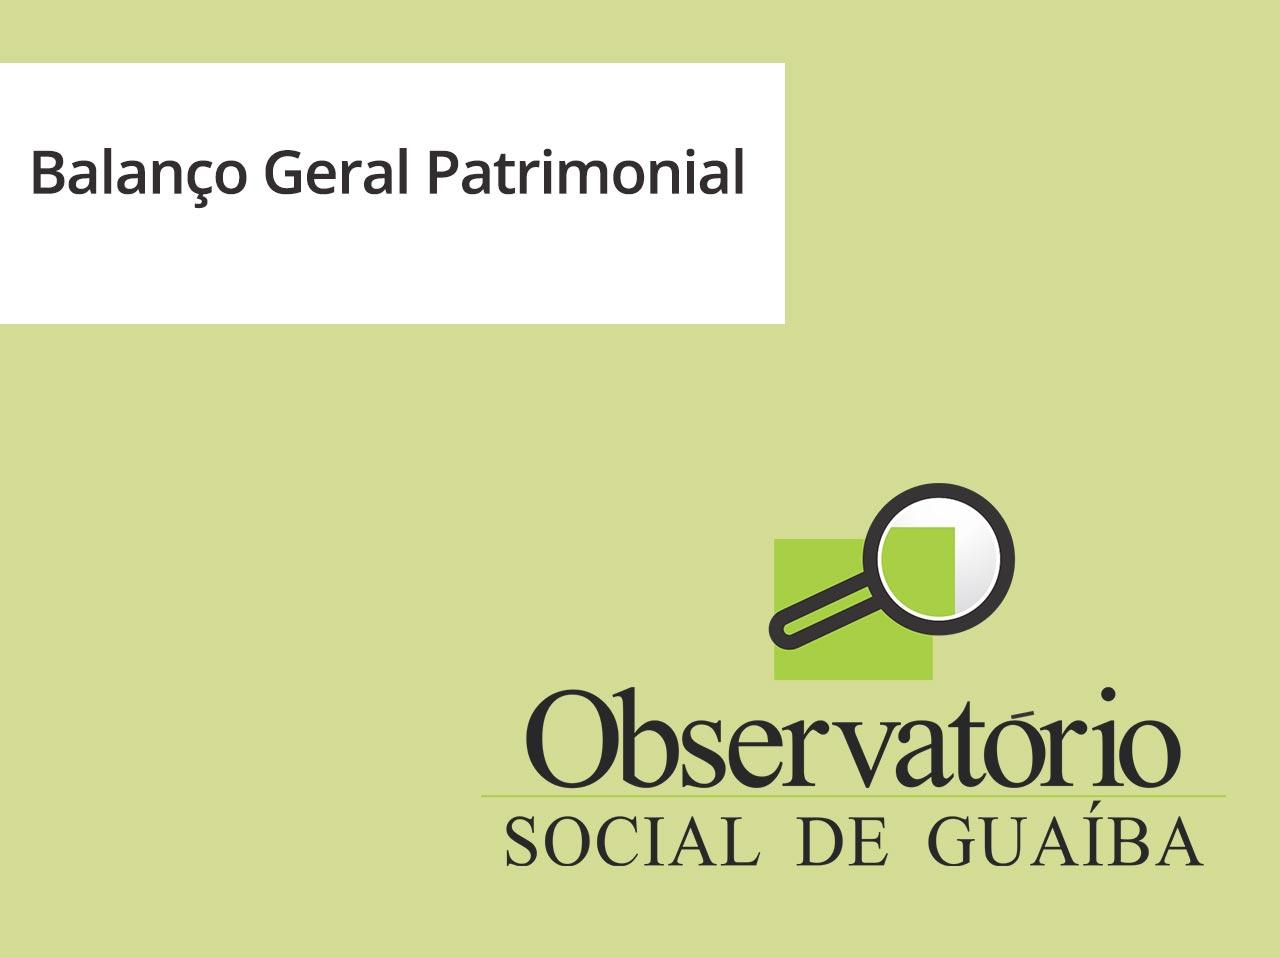 Balanço Geral Patrimonial